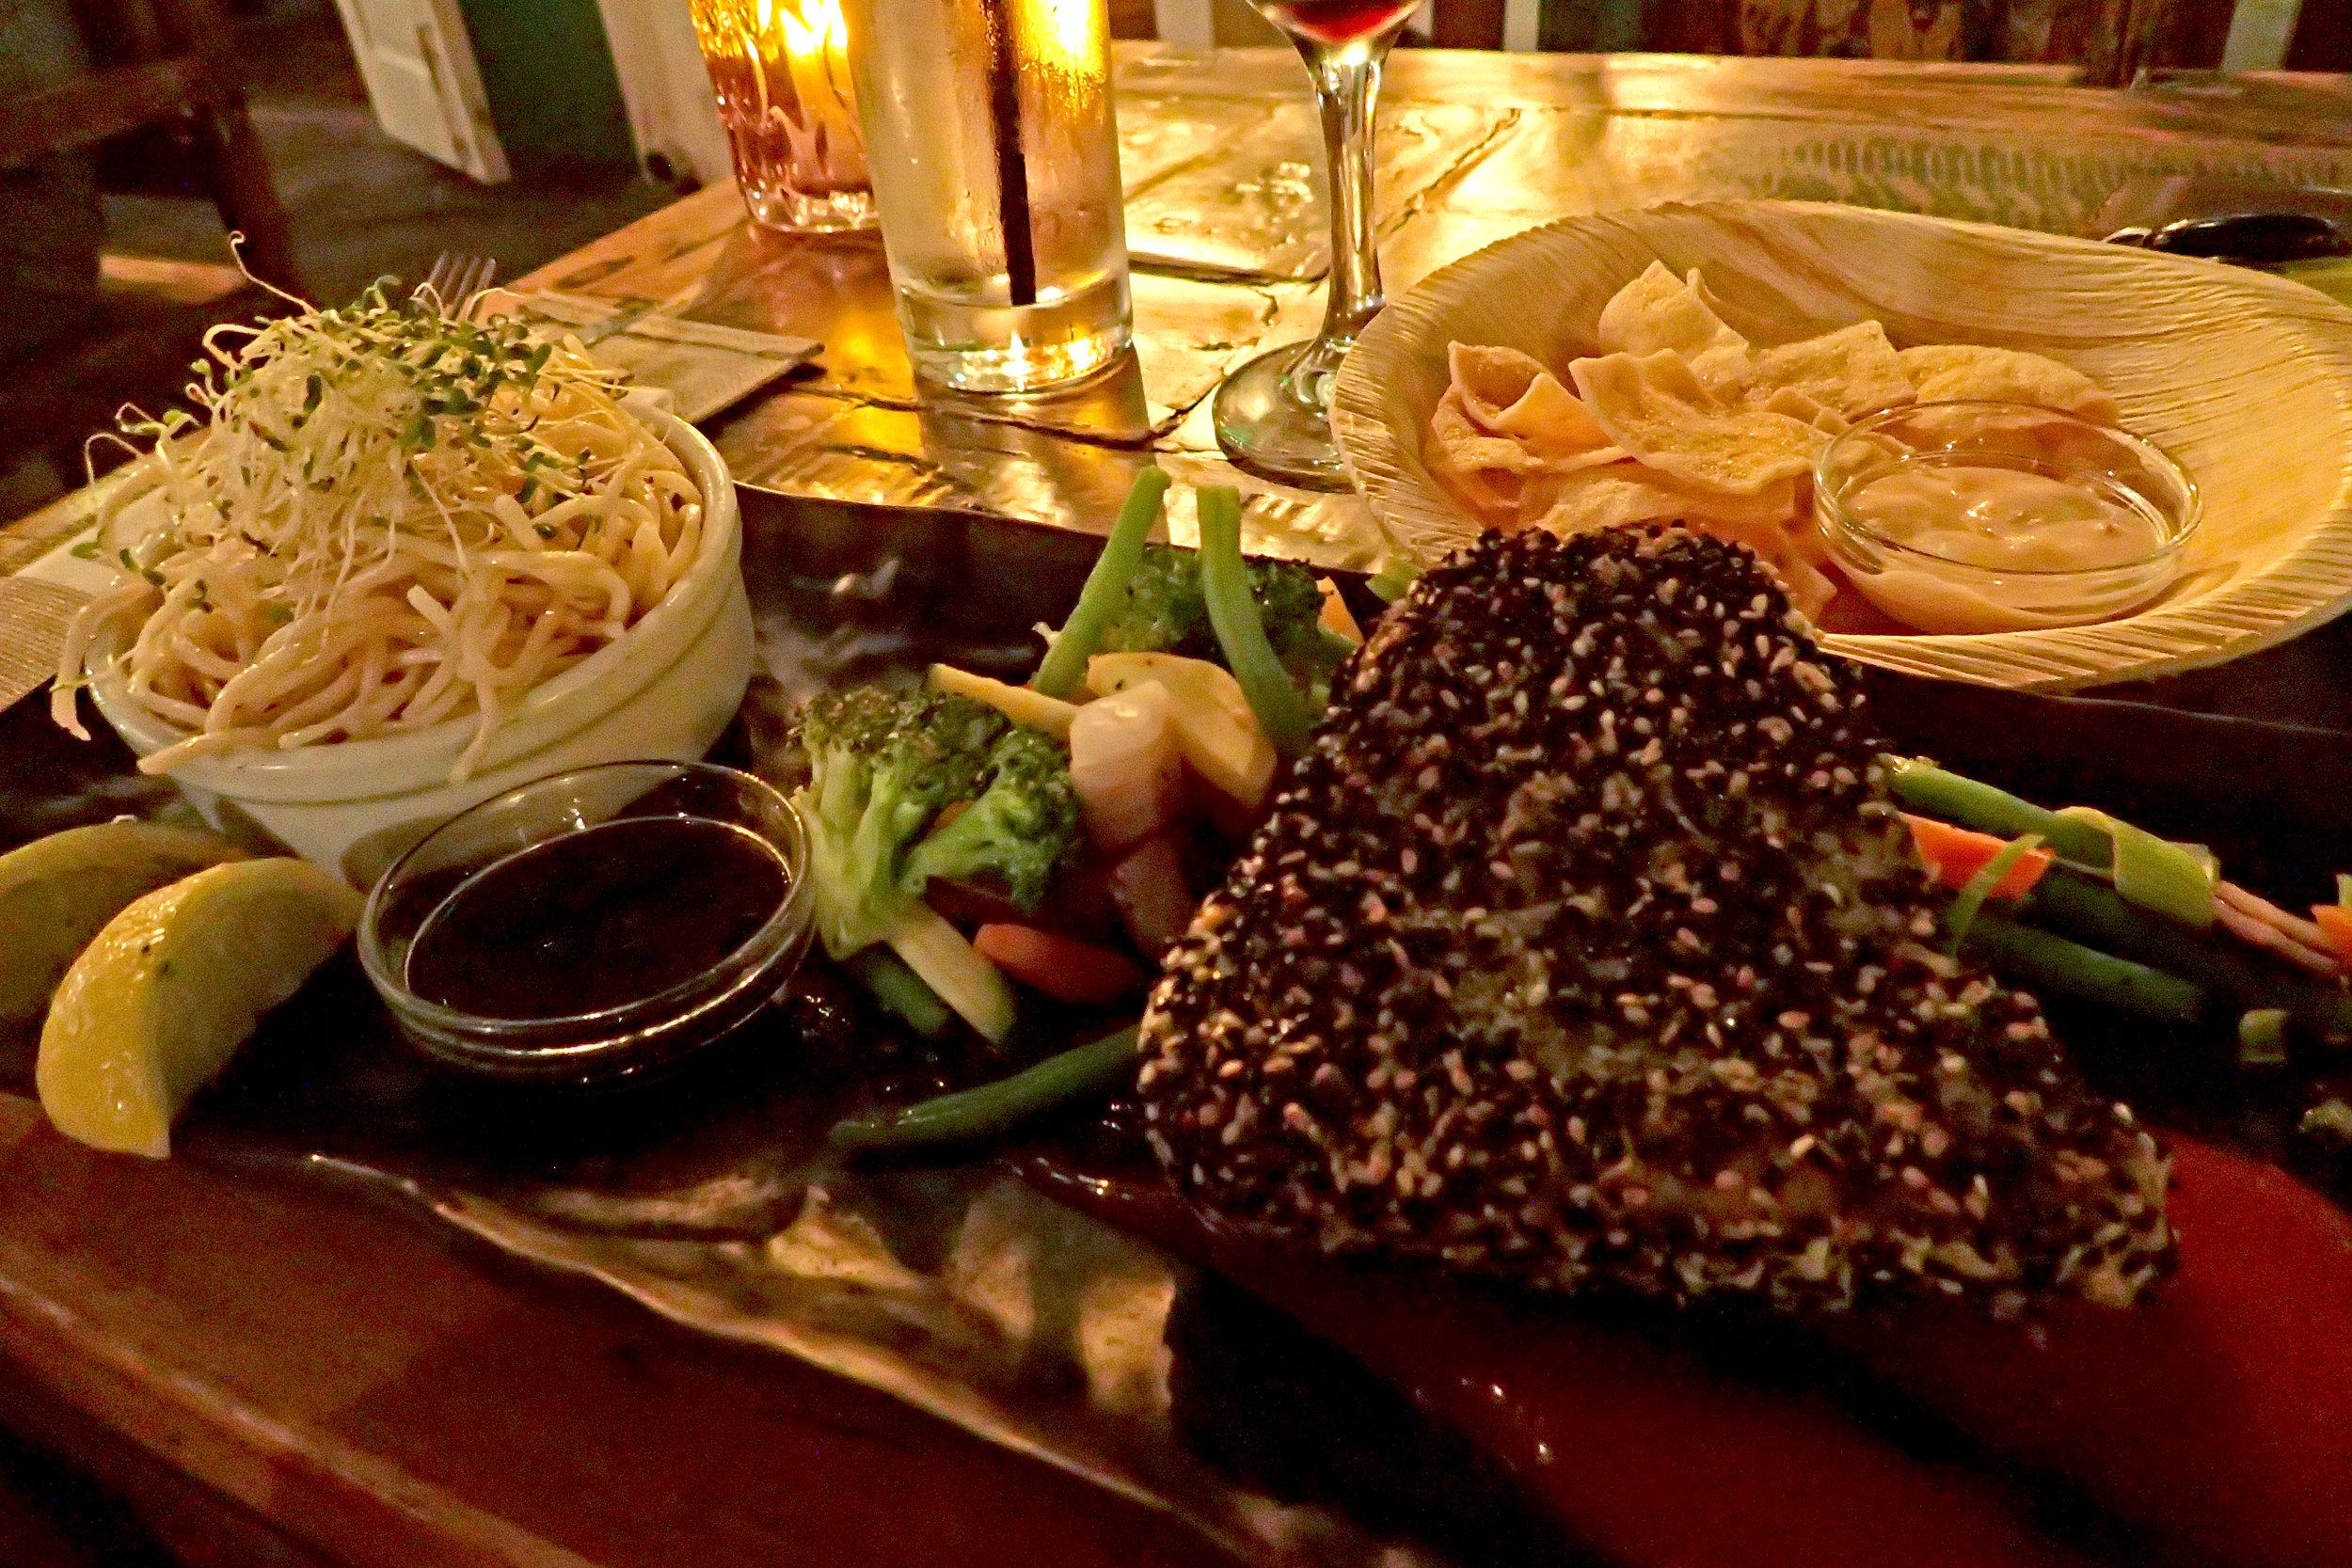 Dinner at Ginger's in Willemstad